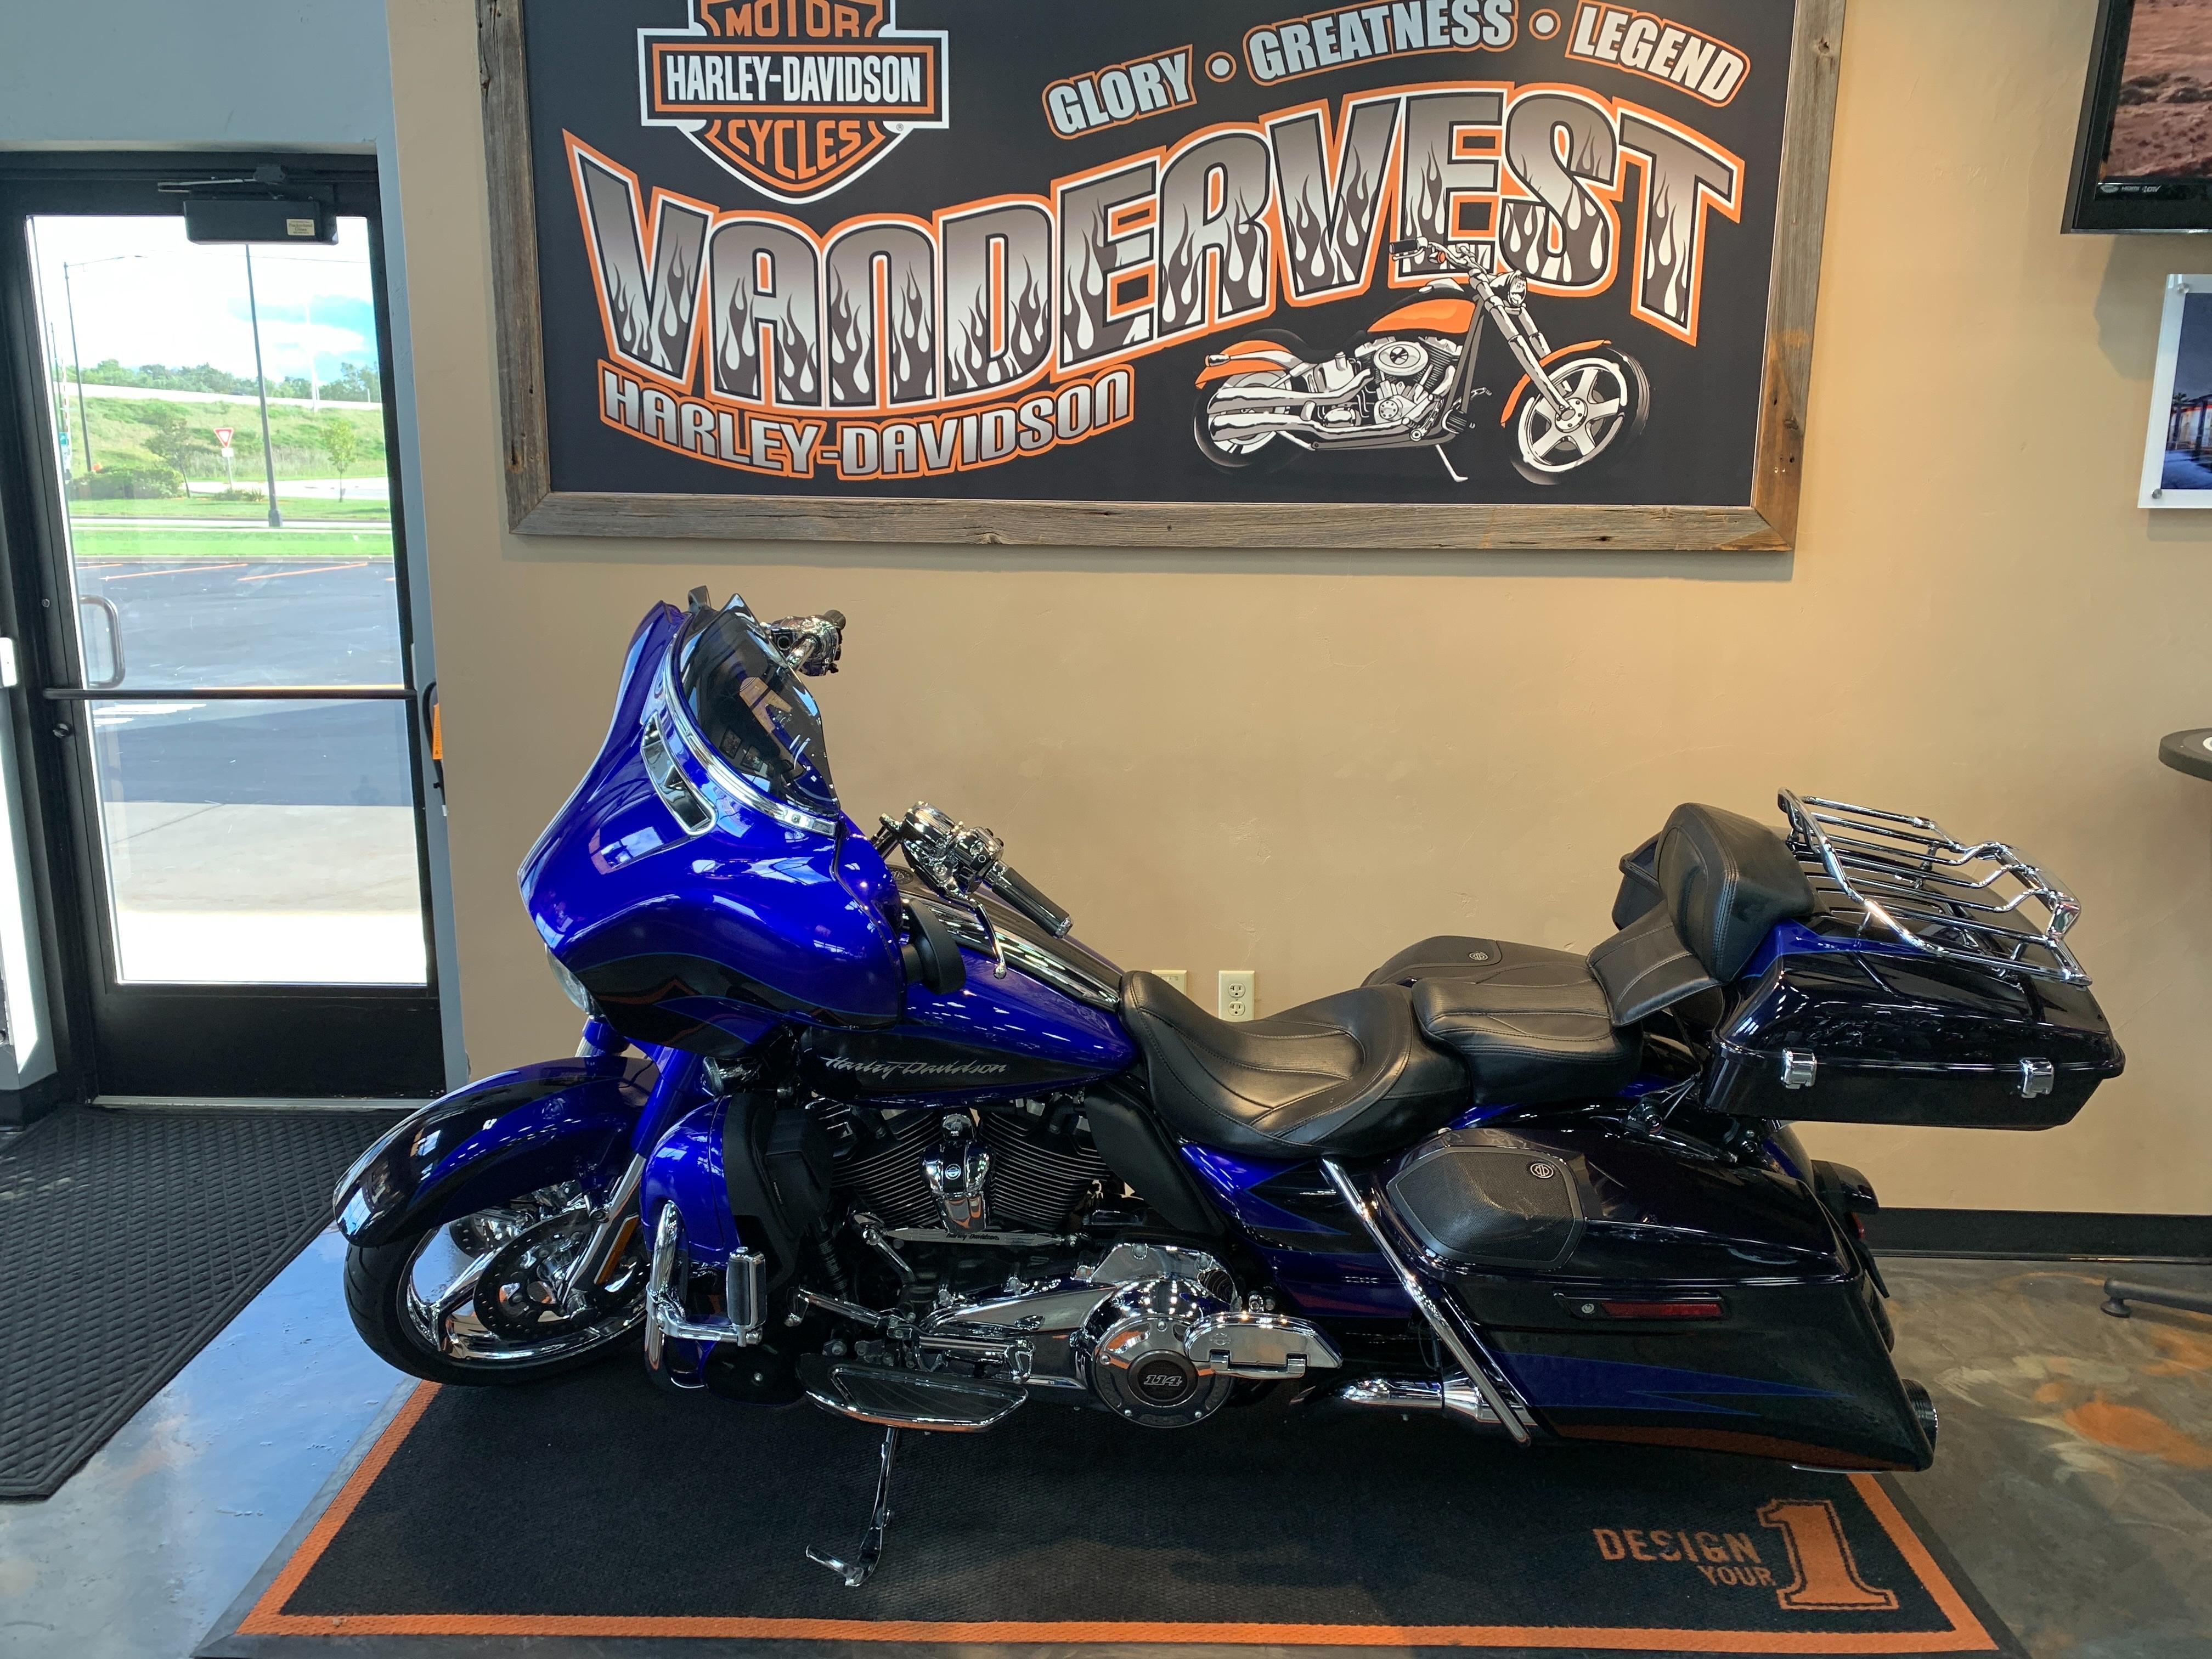 2017 Harley-Davidson Street Glide CVO Street Glide at Vandervest Harley-Davidson, Green Bay, WI 54303